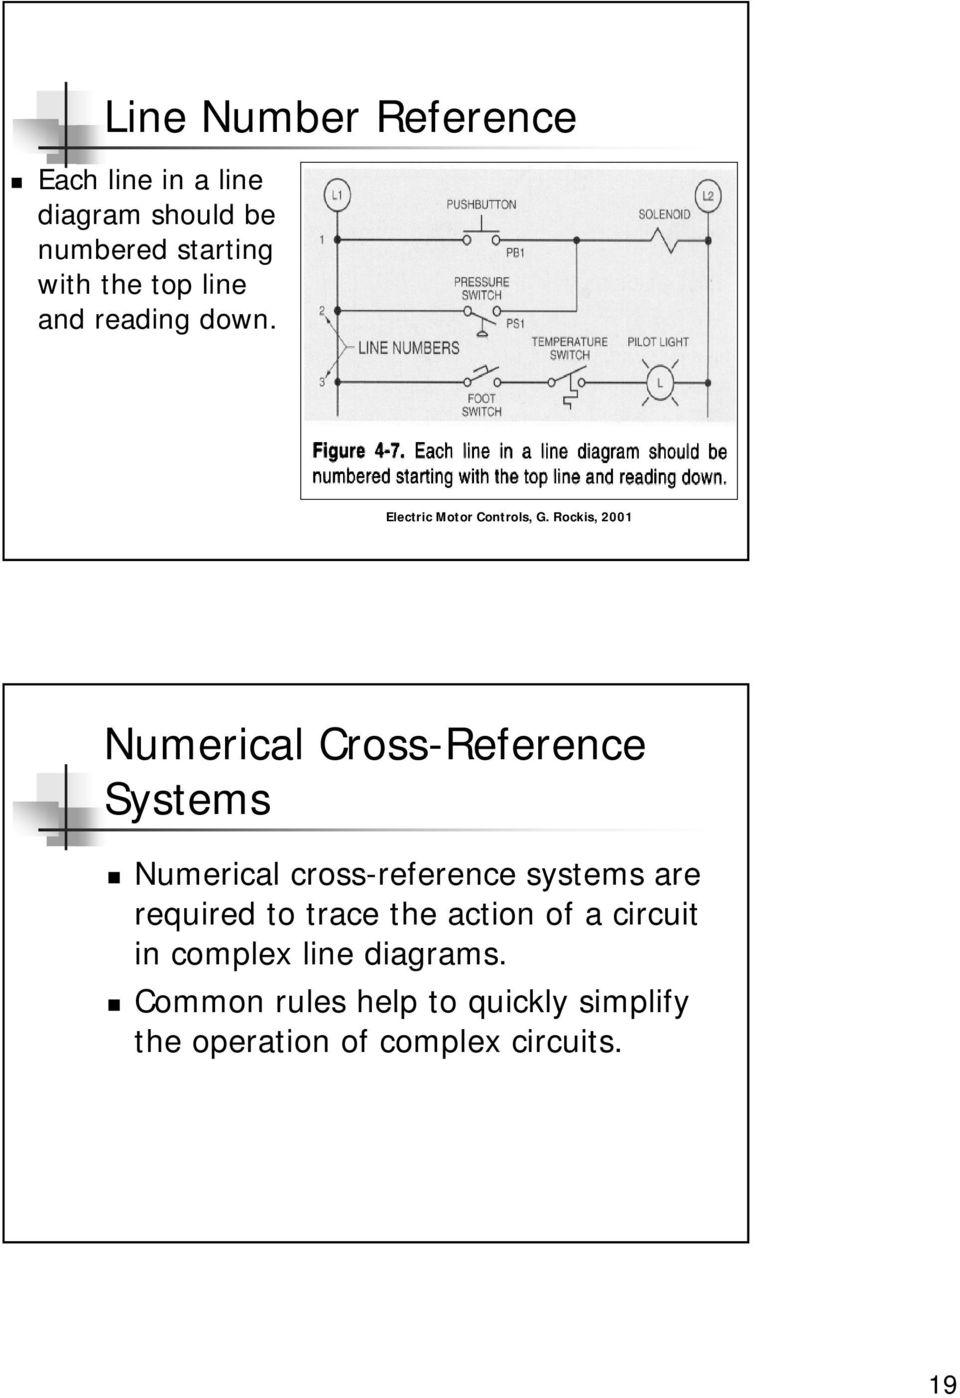 medium resolution of numerical cross reference systems numerical cross reference systems are required